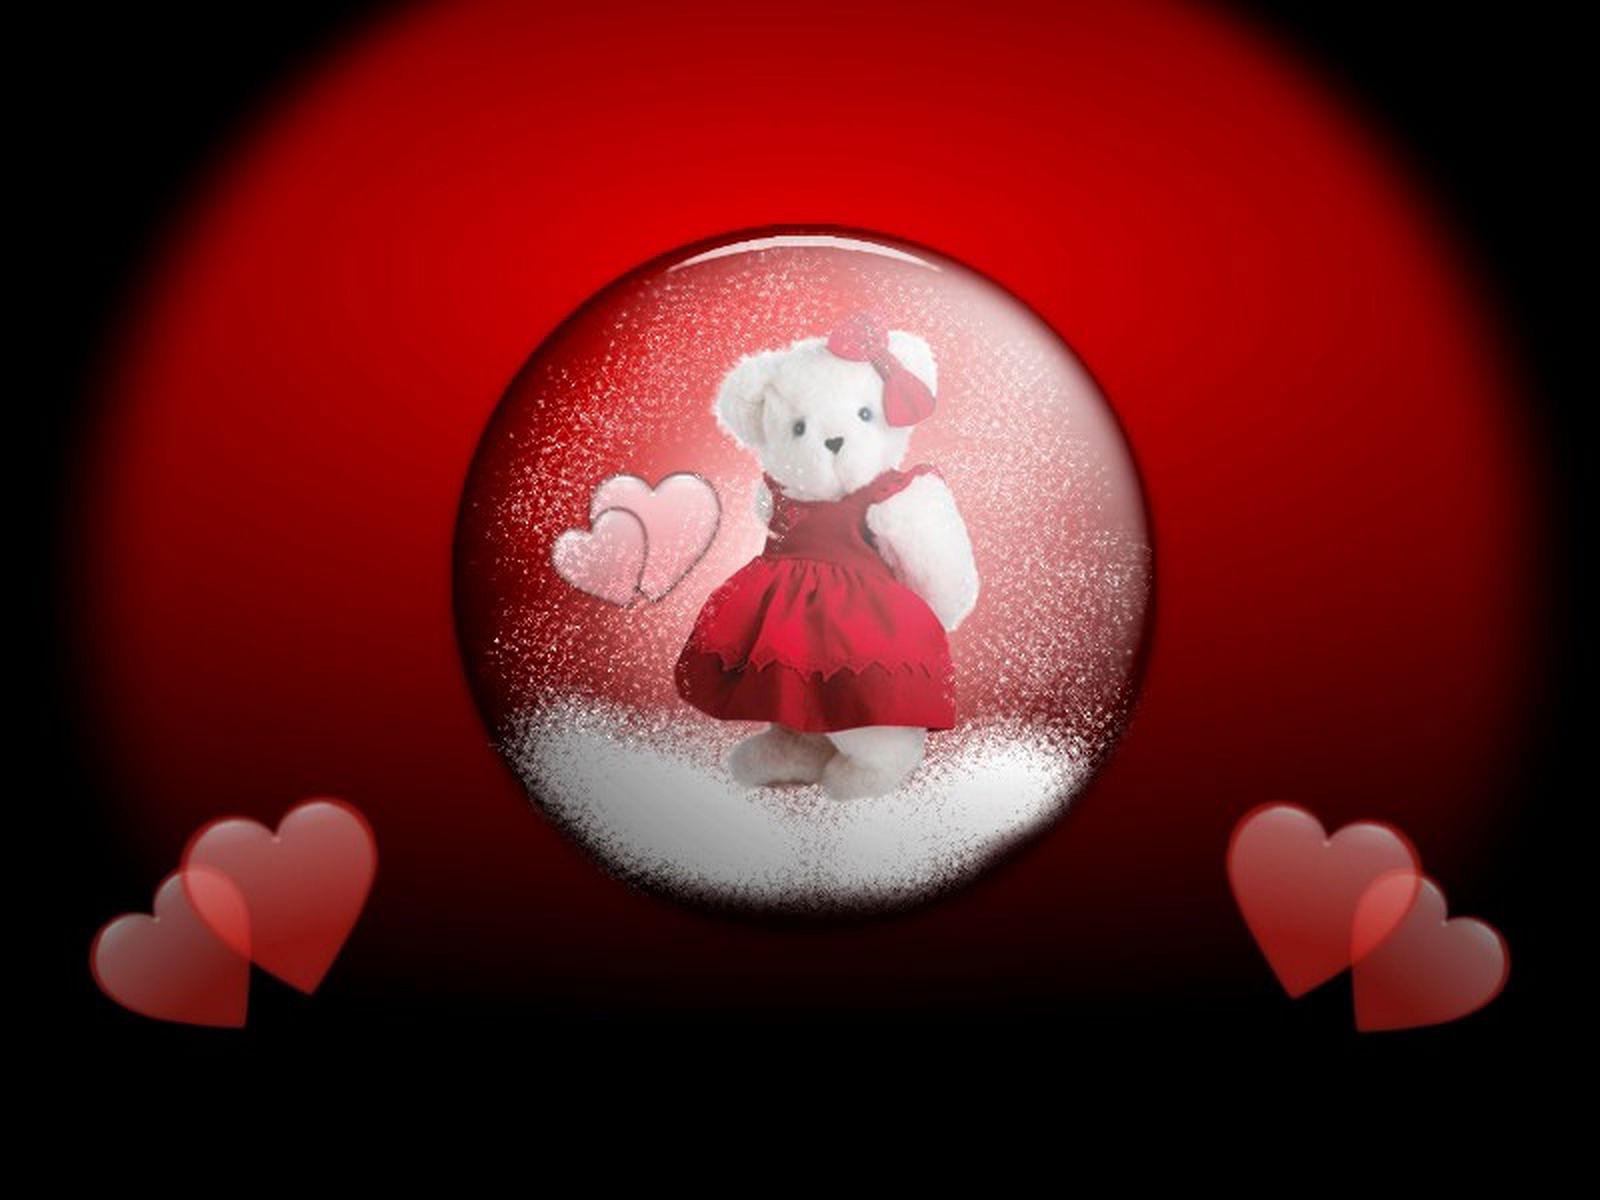 www love wallpaper com,red,pink,valentine's day,love,cartoon